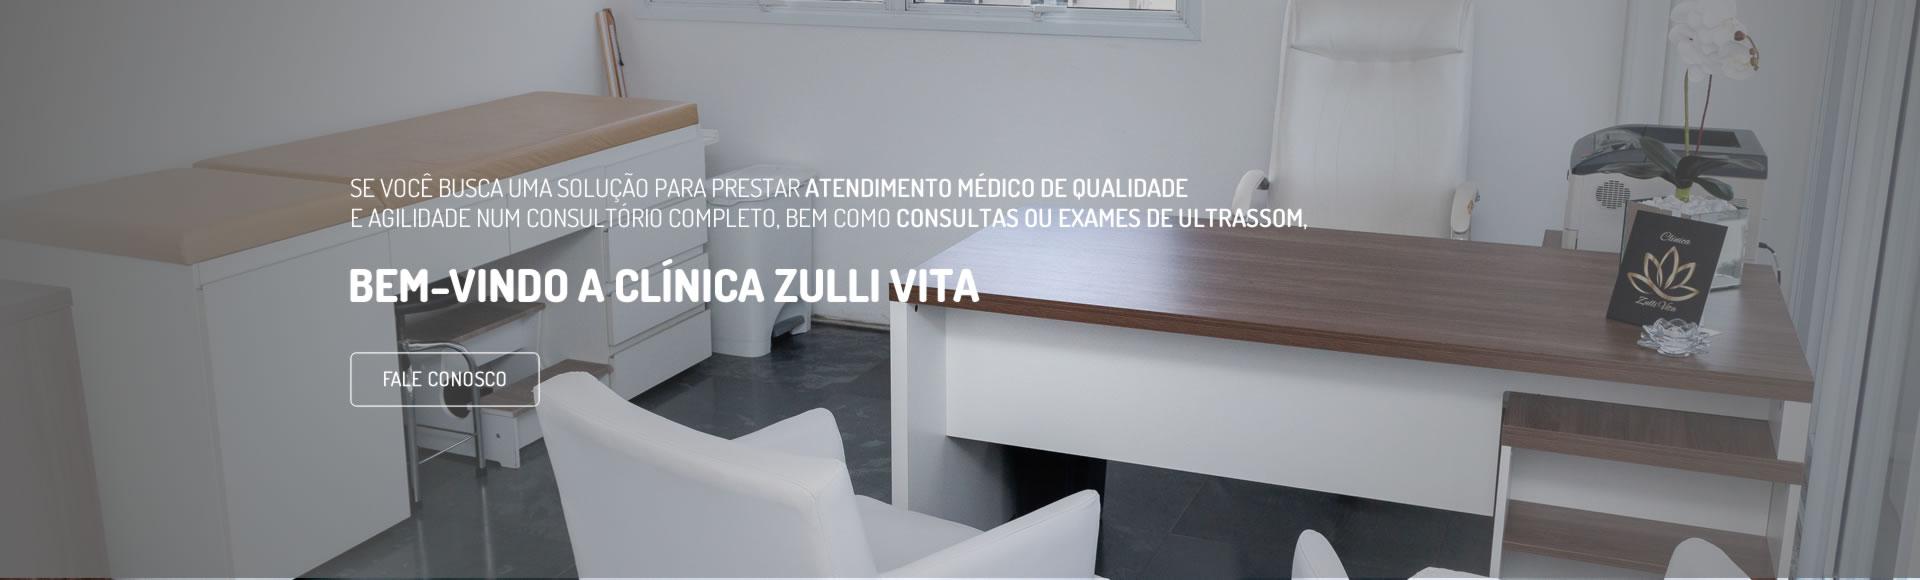 [Bem-vindo a Clínica Zulli Vita]